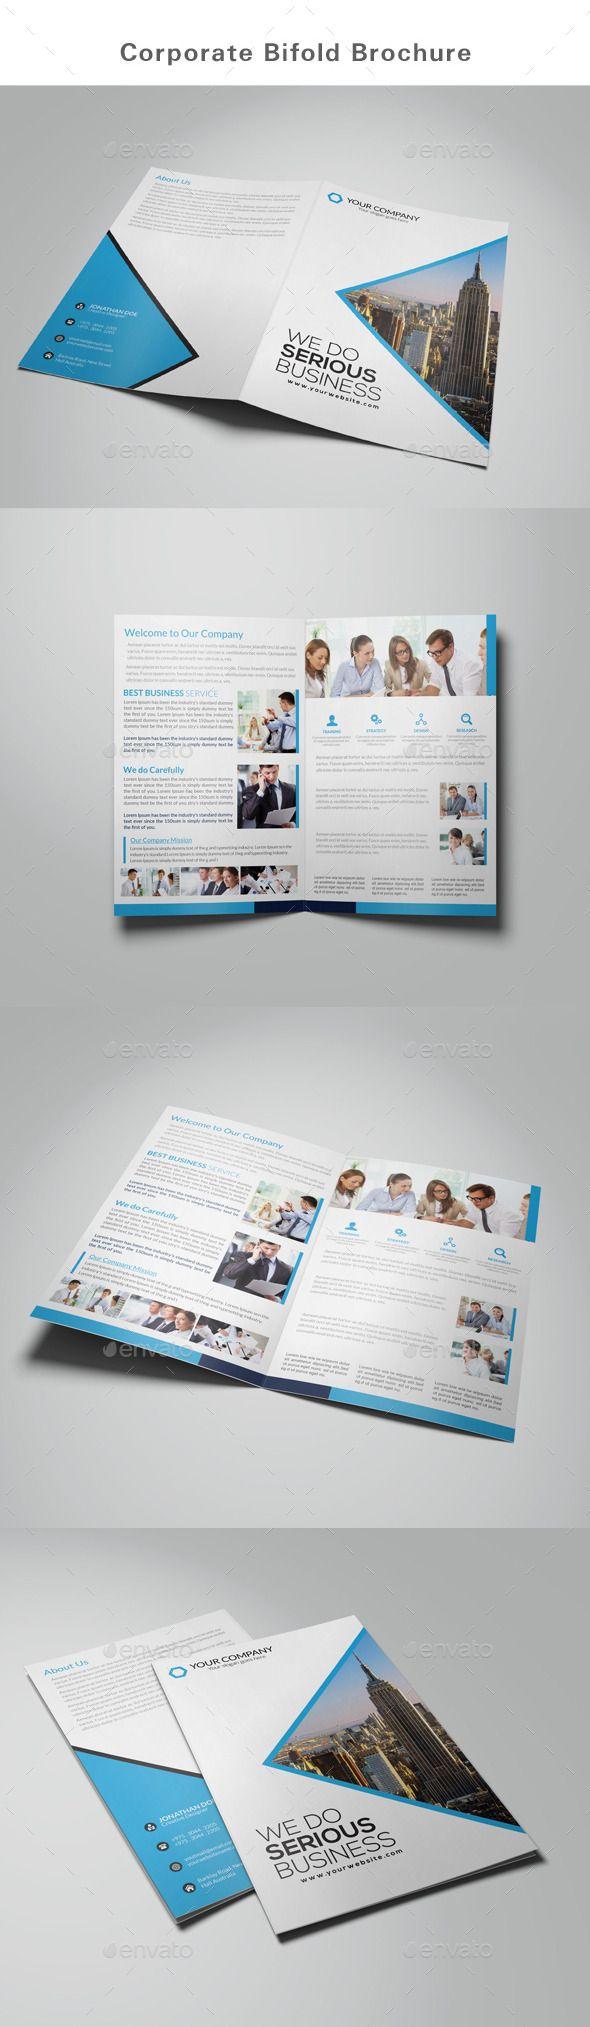 Business Bifold Brochure Template #design Download: http://graphicriver.net/item/bifold-brochure-business/12761014?ref=ksioks